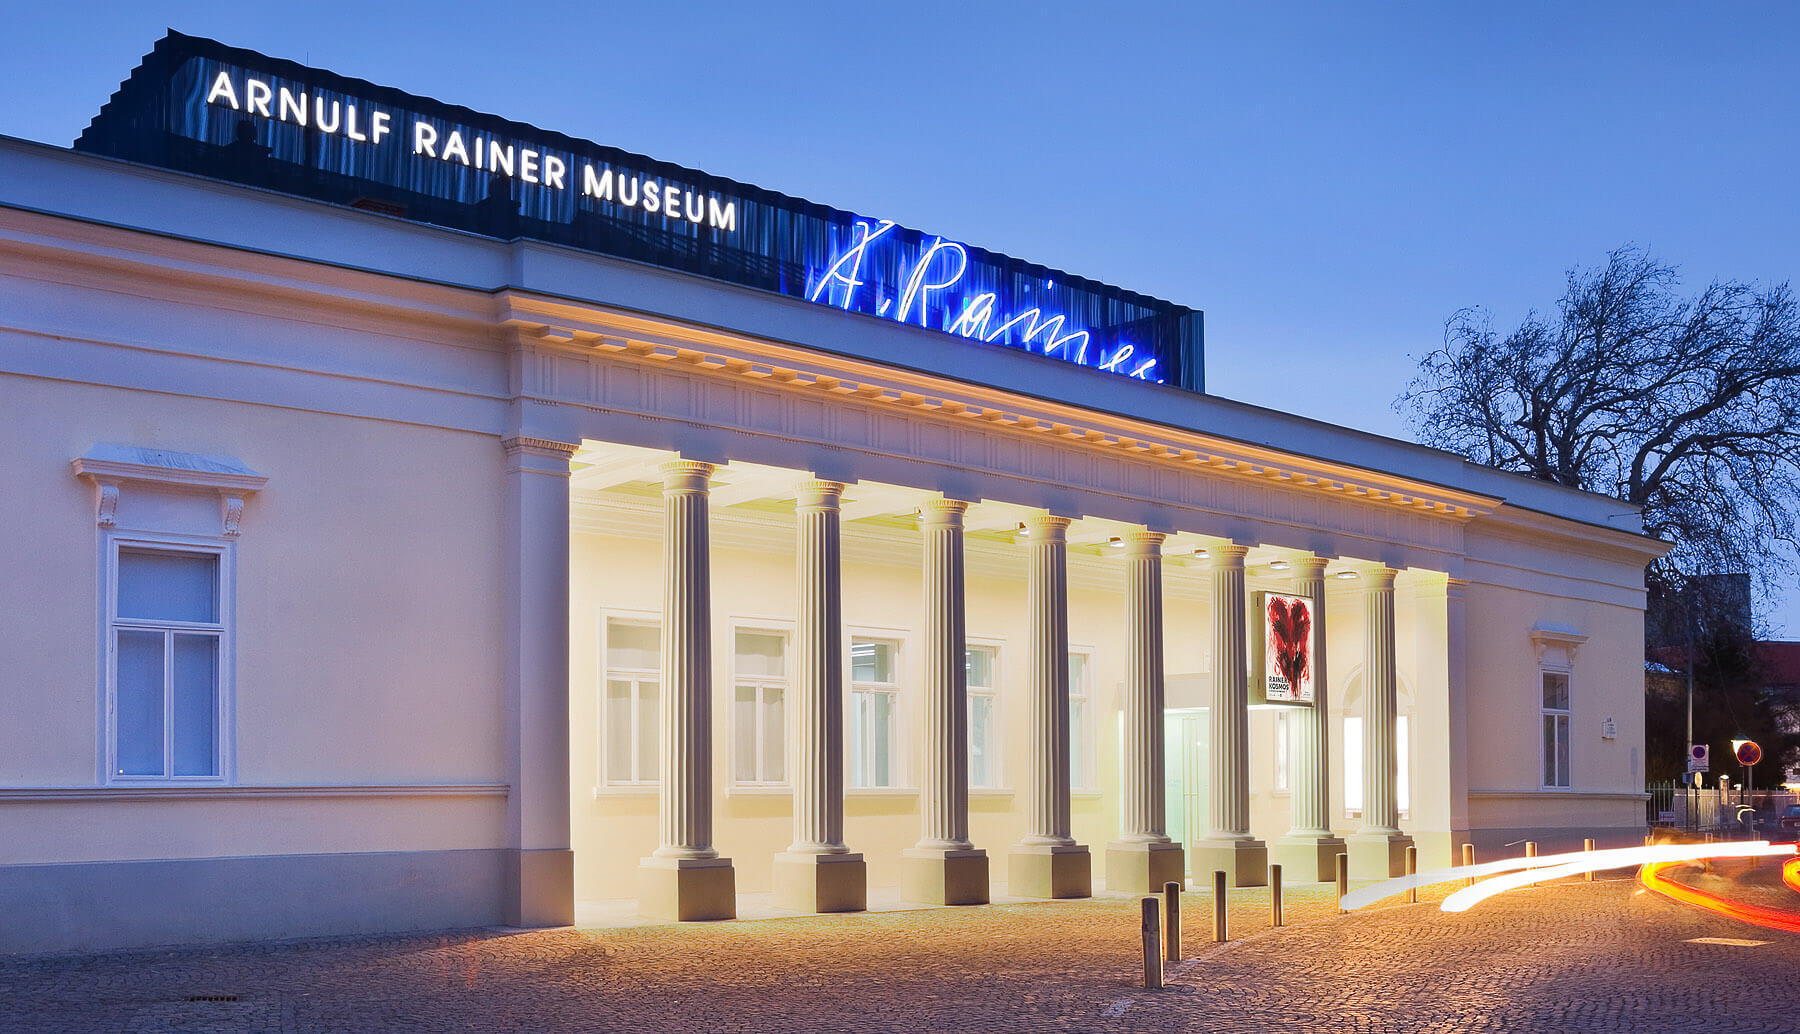 Arnulf Rainer Museum, Baden. Copyright: Arnulf Rainer Museum.